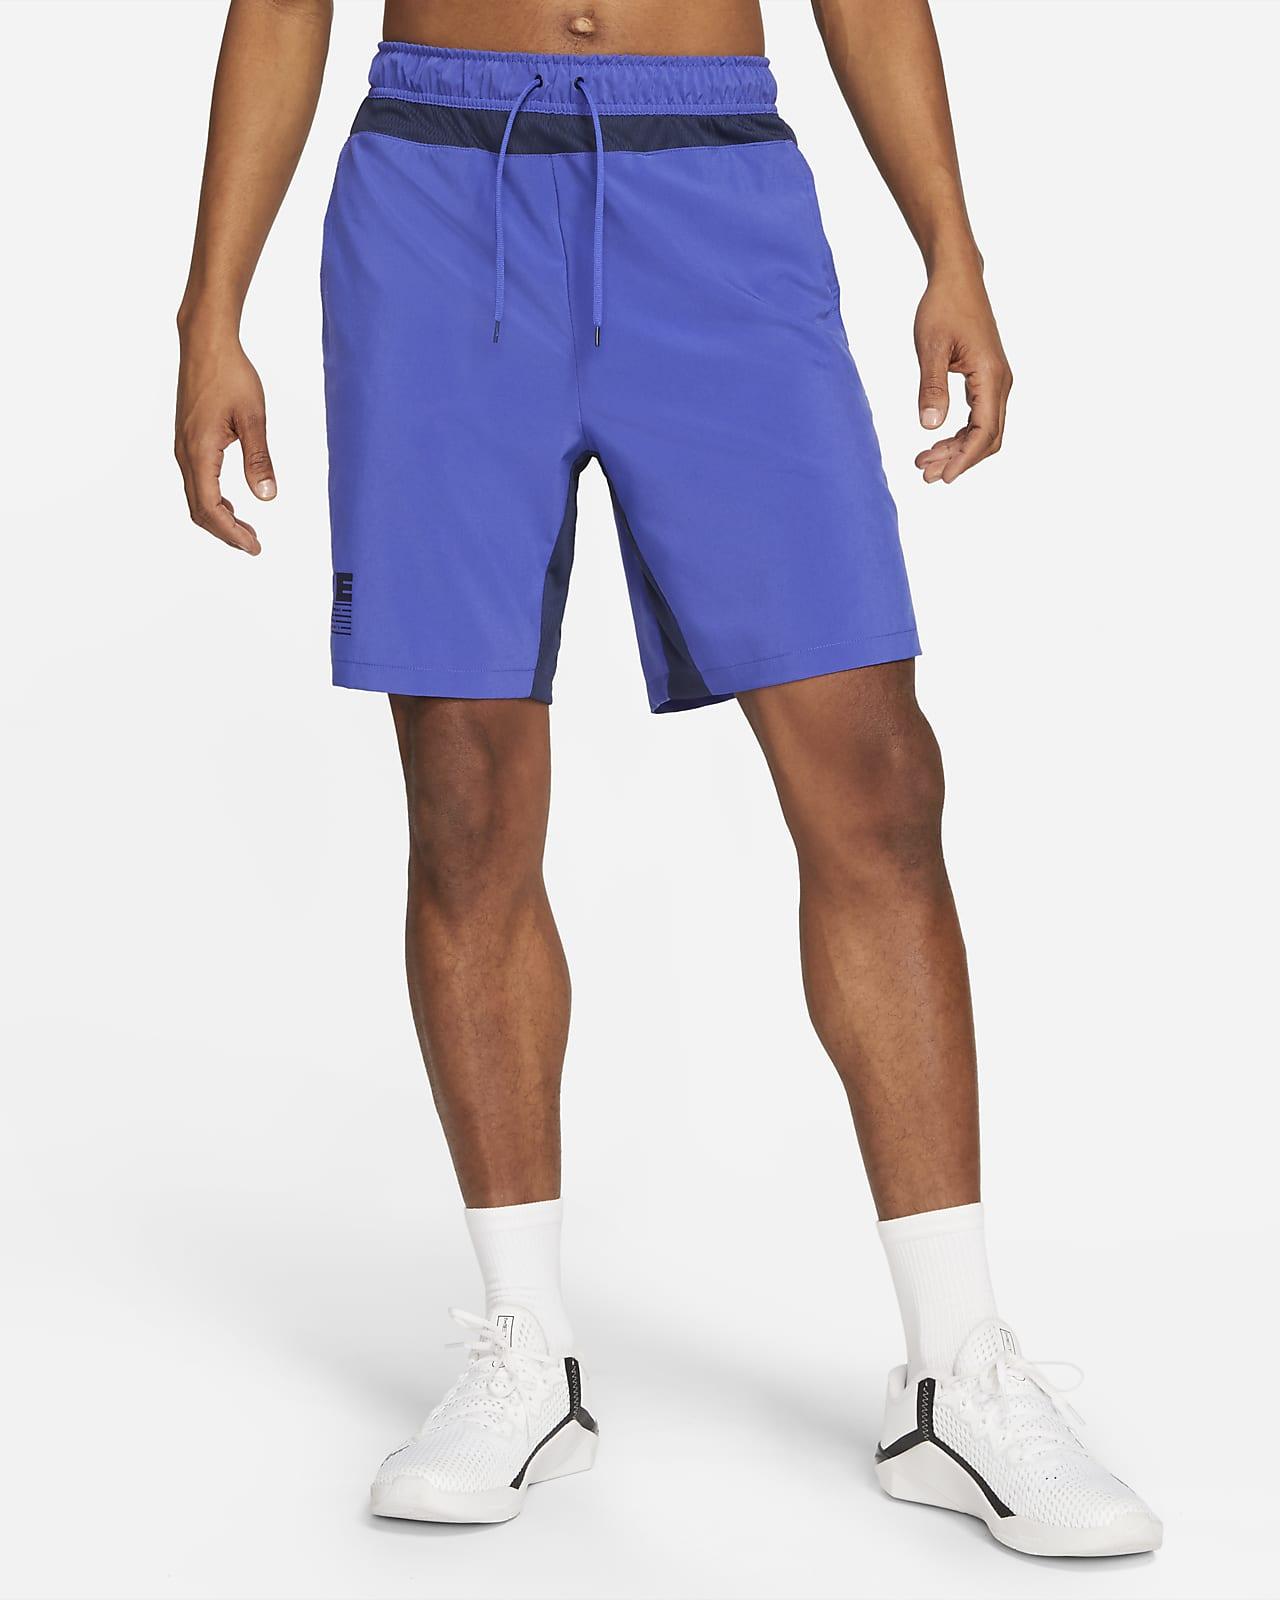 Nike Flex Men's Graphic Training Shorts